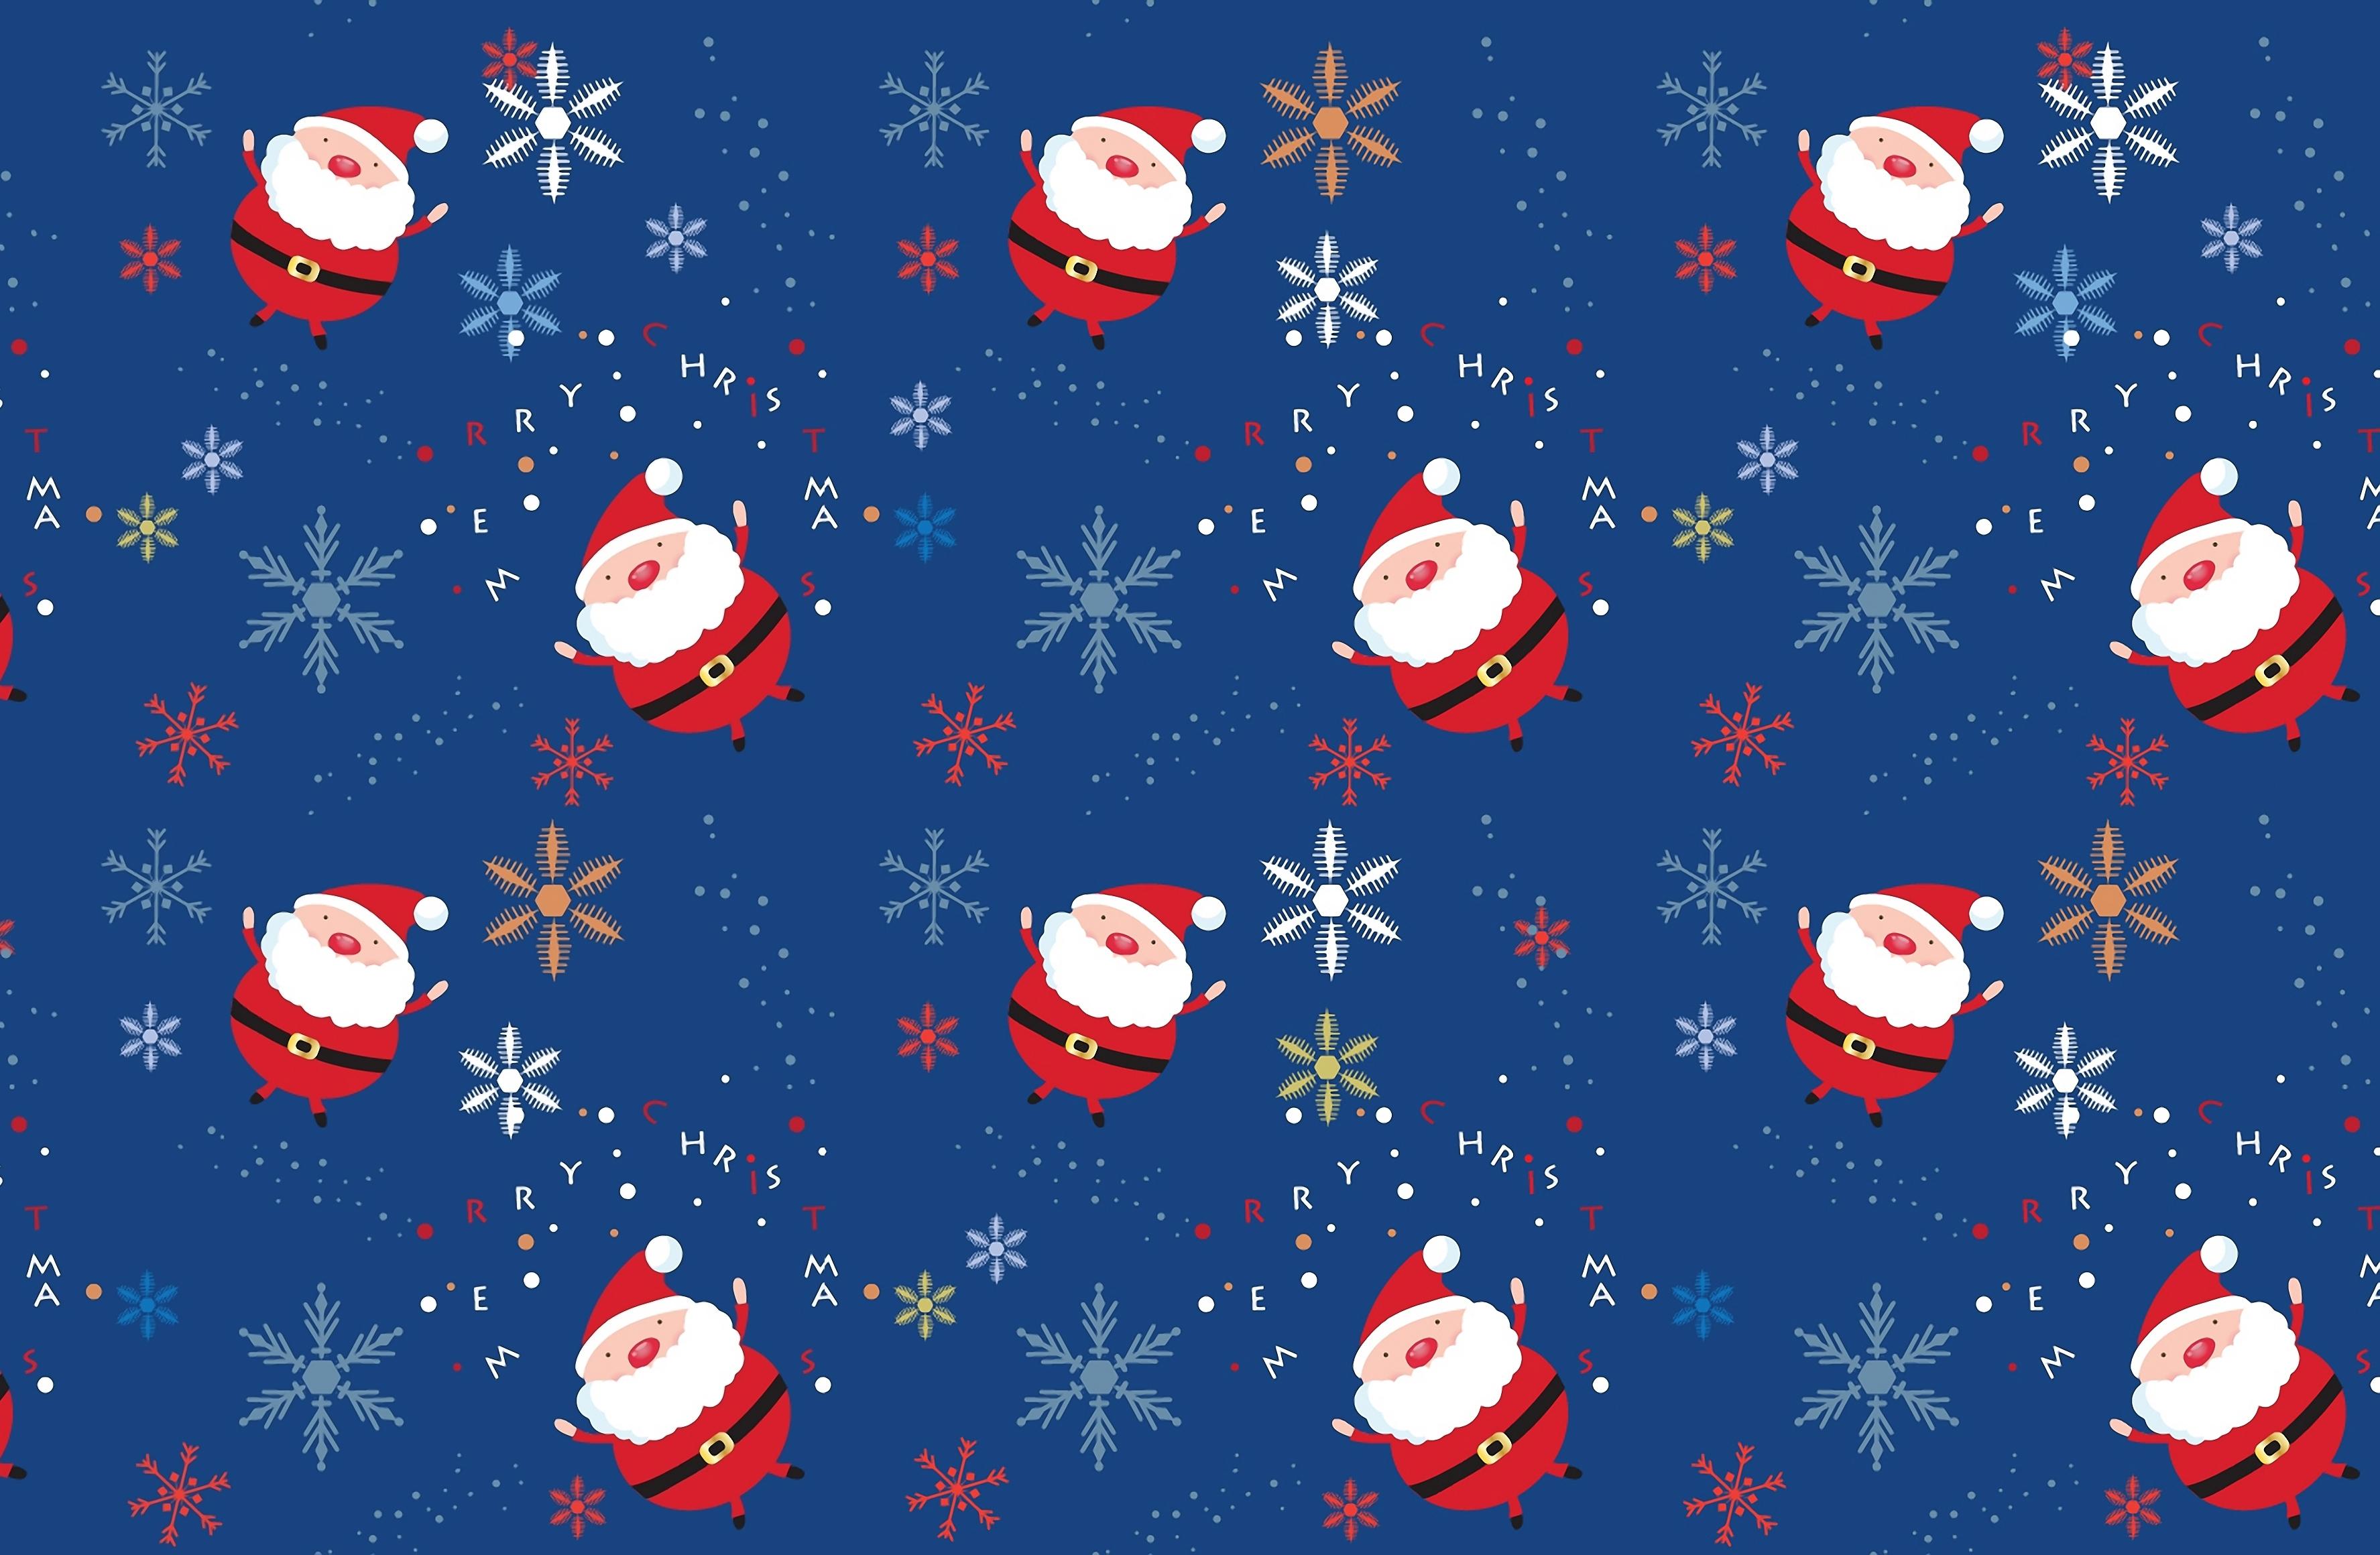 Santa Claus image PPT Backgrounds